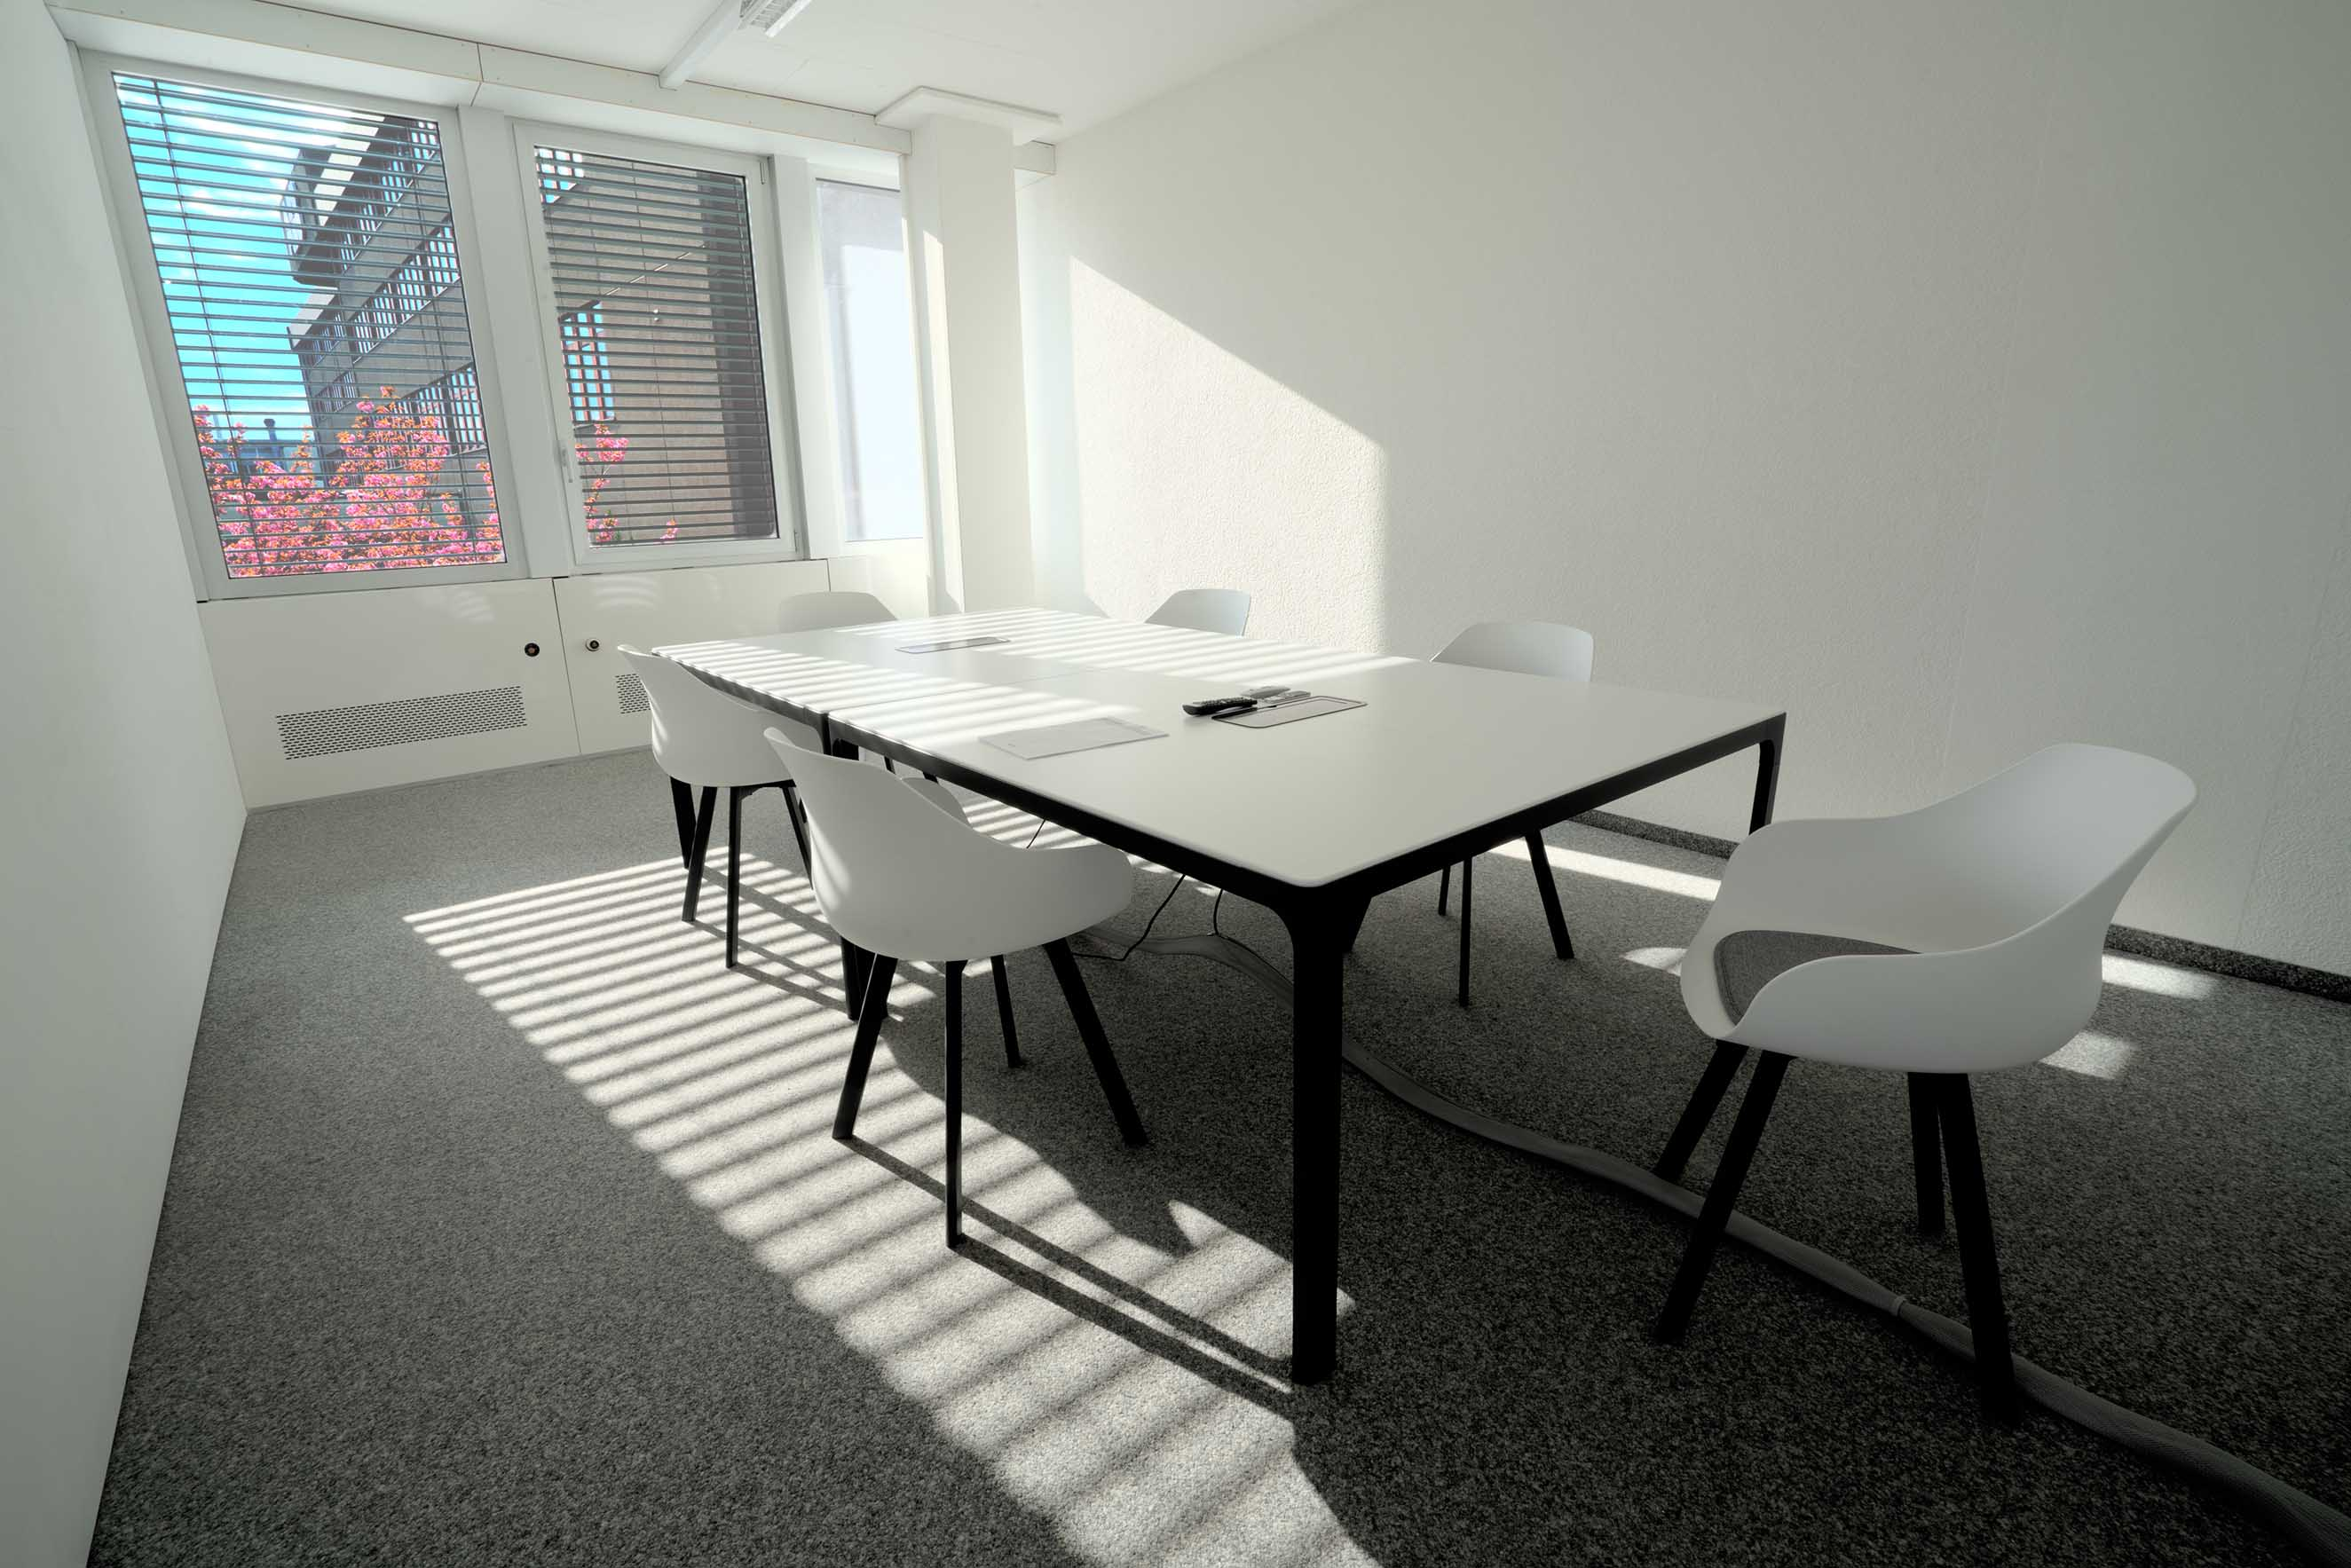 Meetingraum, Room, Design, Loght, Licht